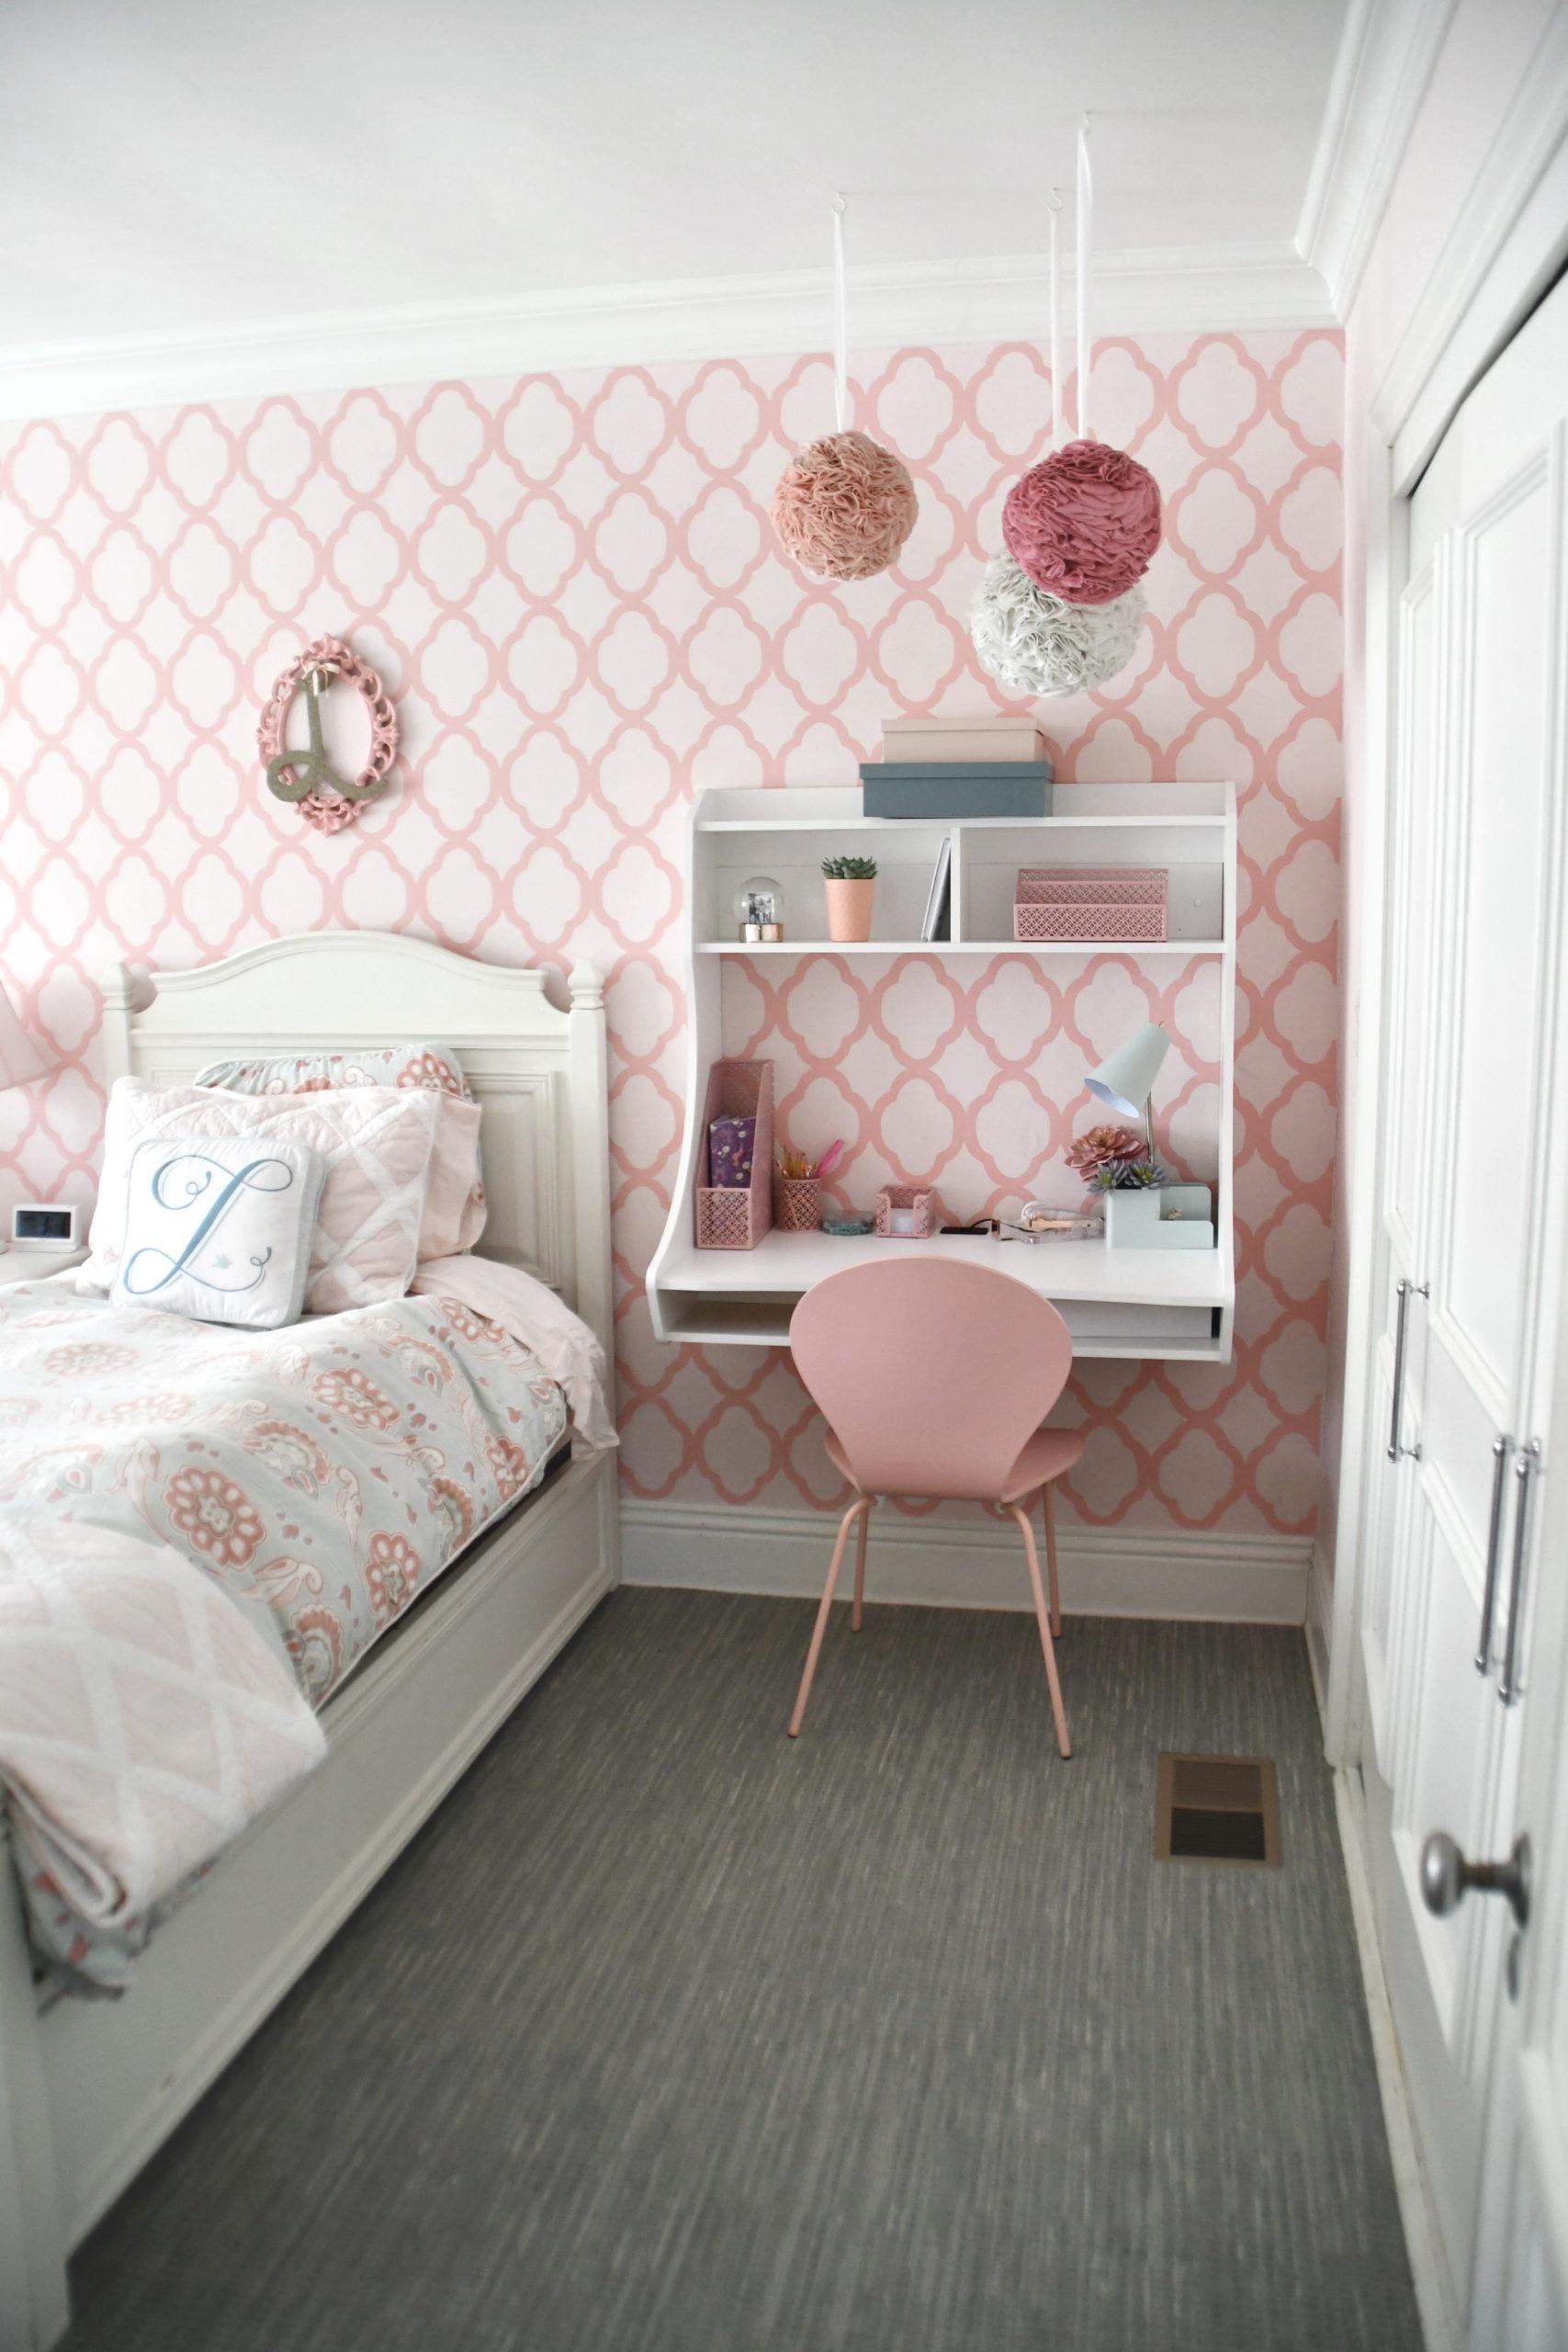 Wall Desk in Shared Girls Room